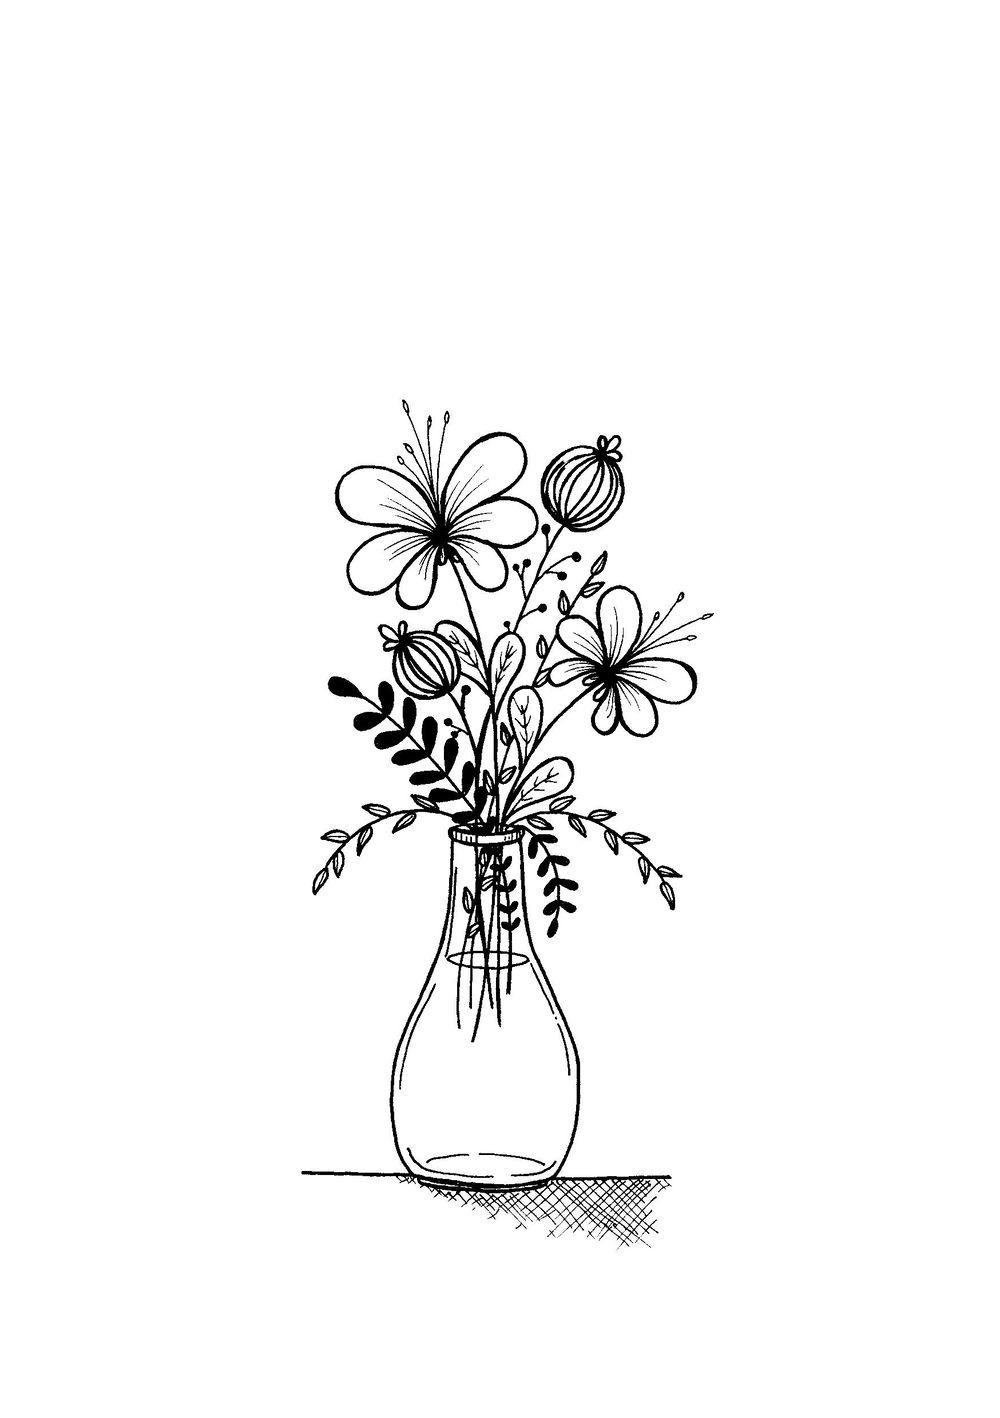 flower and leaf doodles - image 2 - student project